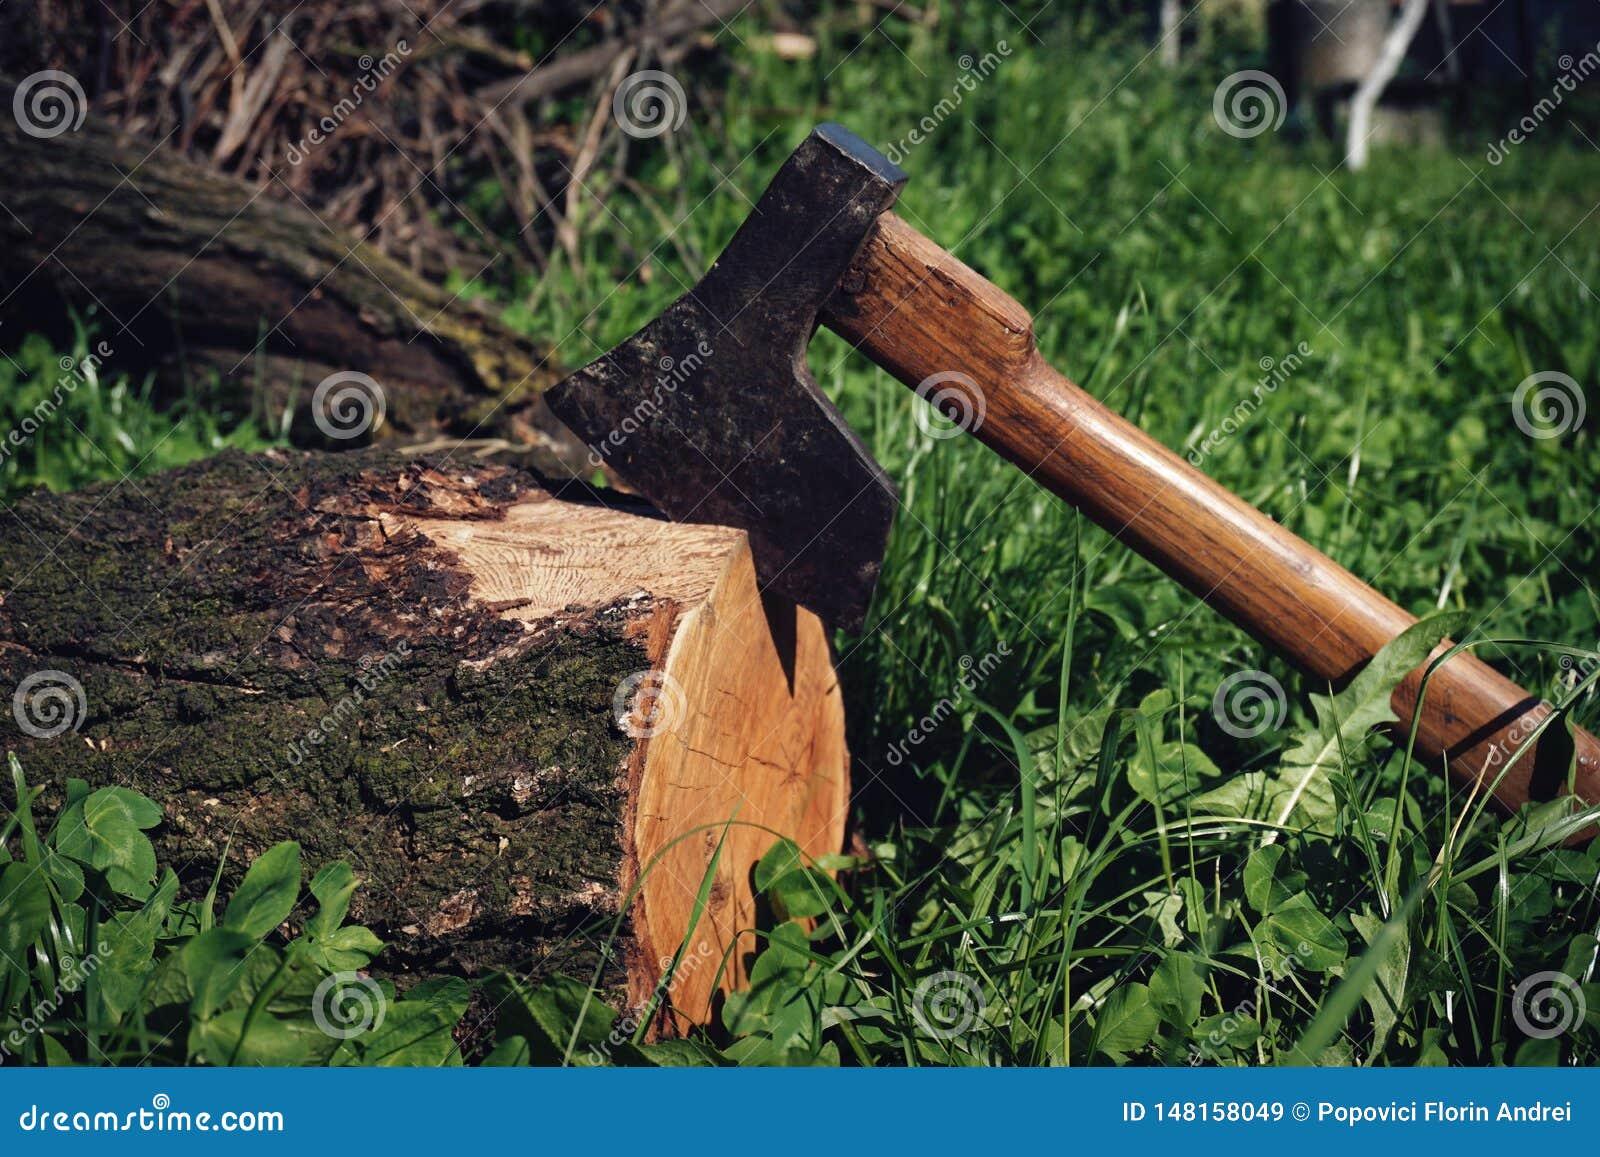 Gamla Rusty Ax i ett klippt träd